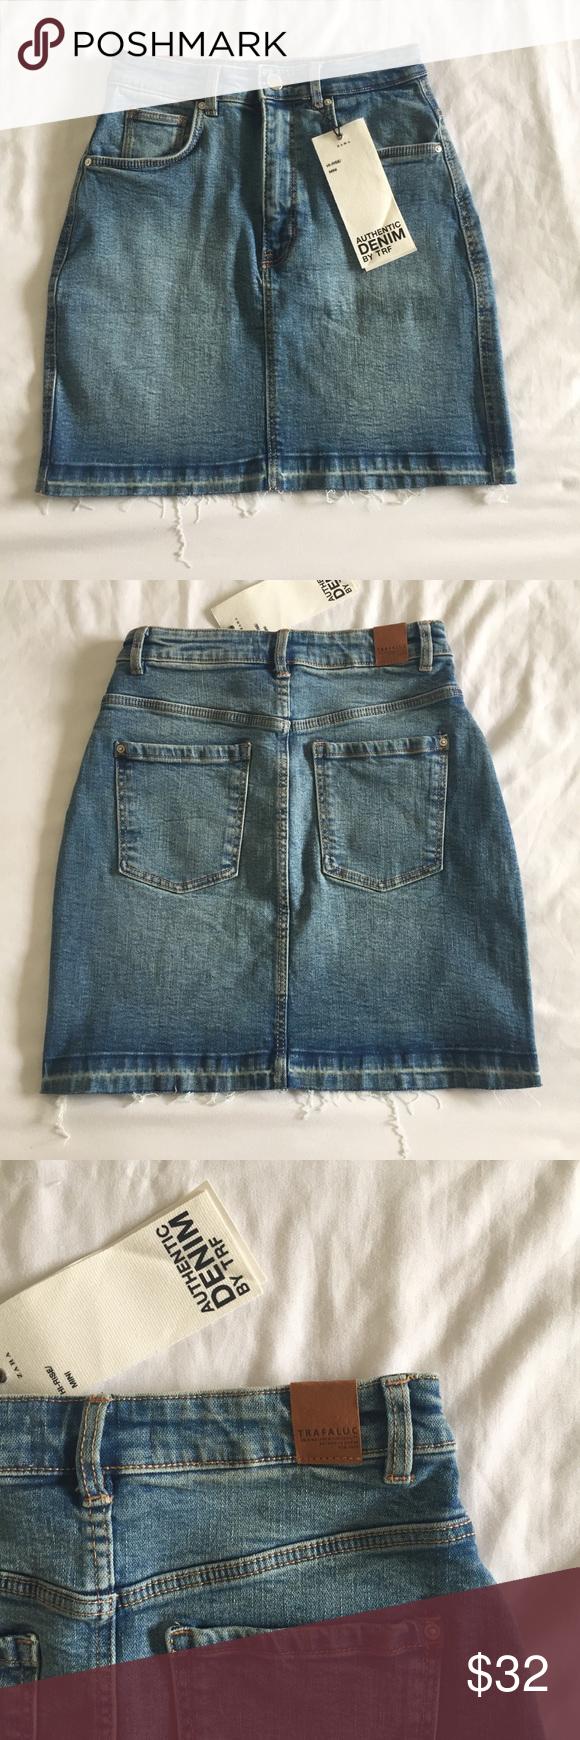 bcdde5b556d5 NWT ZARA trafaluc high rise denim mini skirt authentic denim mini skirt by  zara! denim is great quality, has some stretch Zara Skirts Mini